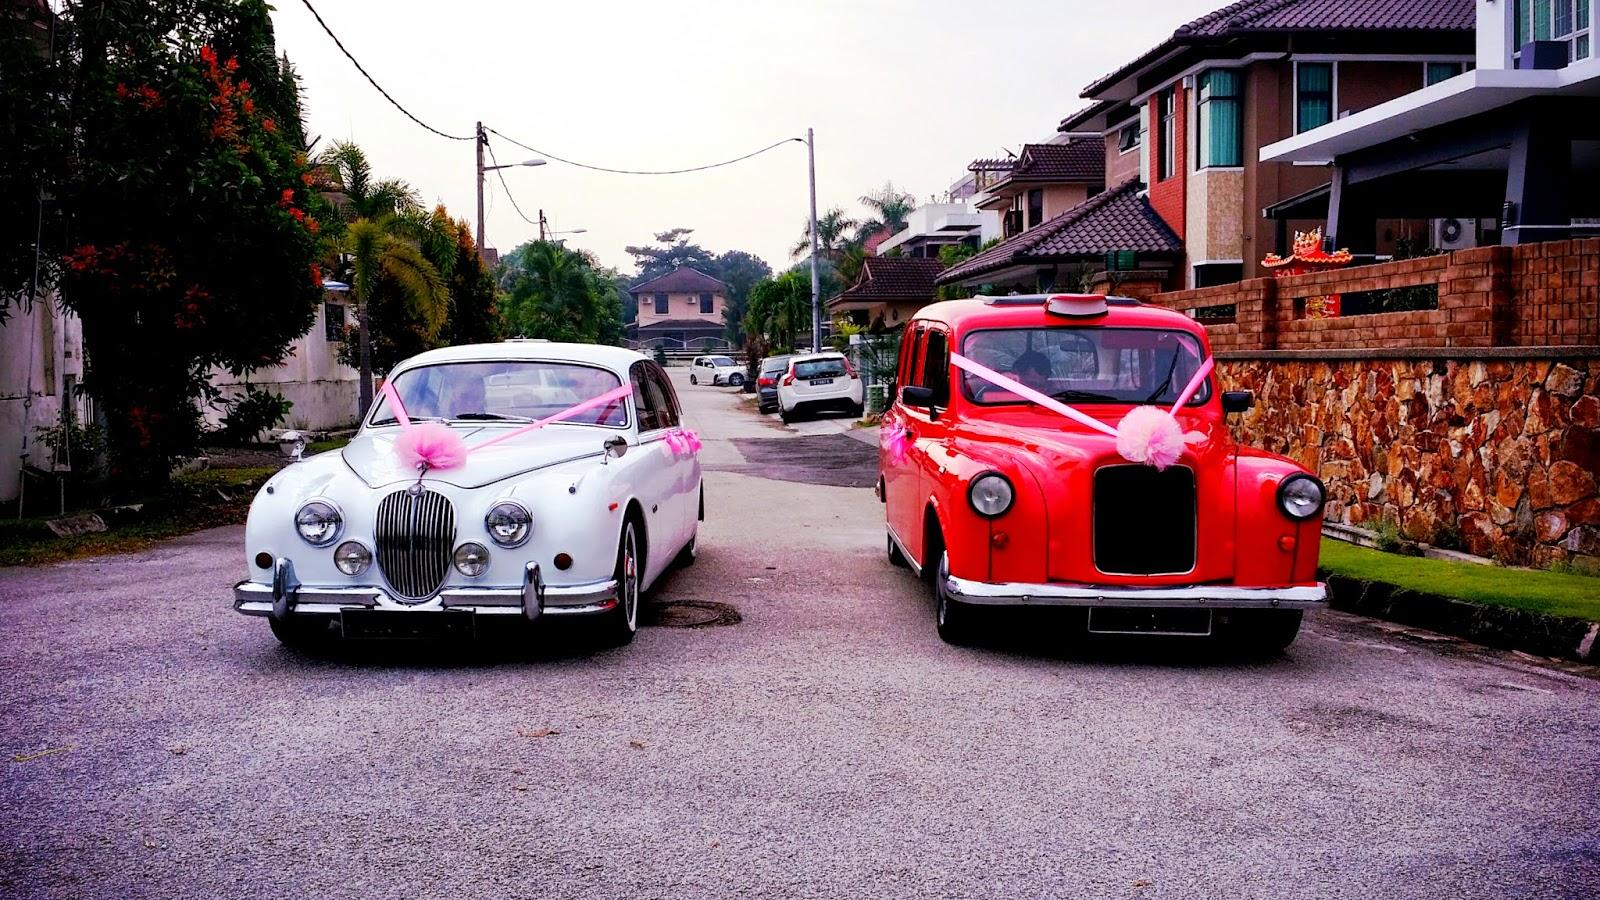 RedOrca Malaysia Wedding and Event Car Rental: Classic wedding cars ...